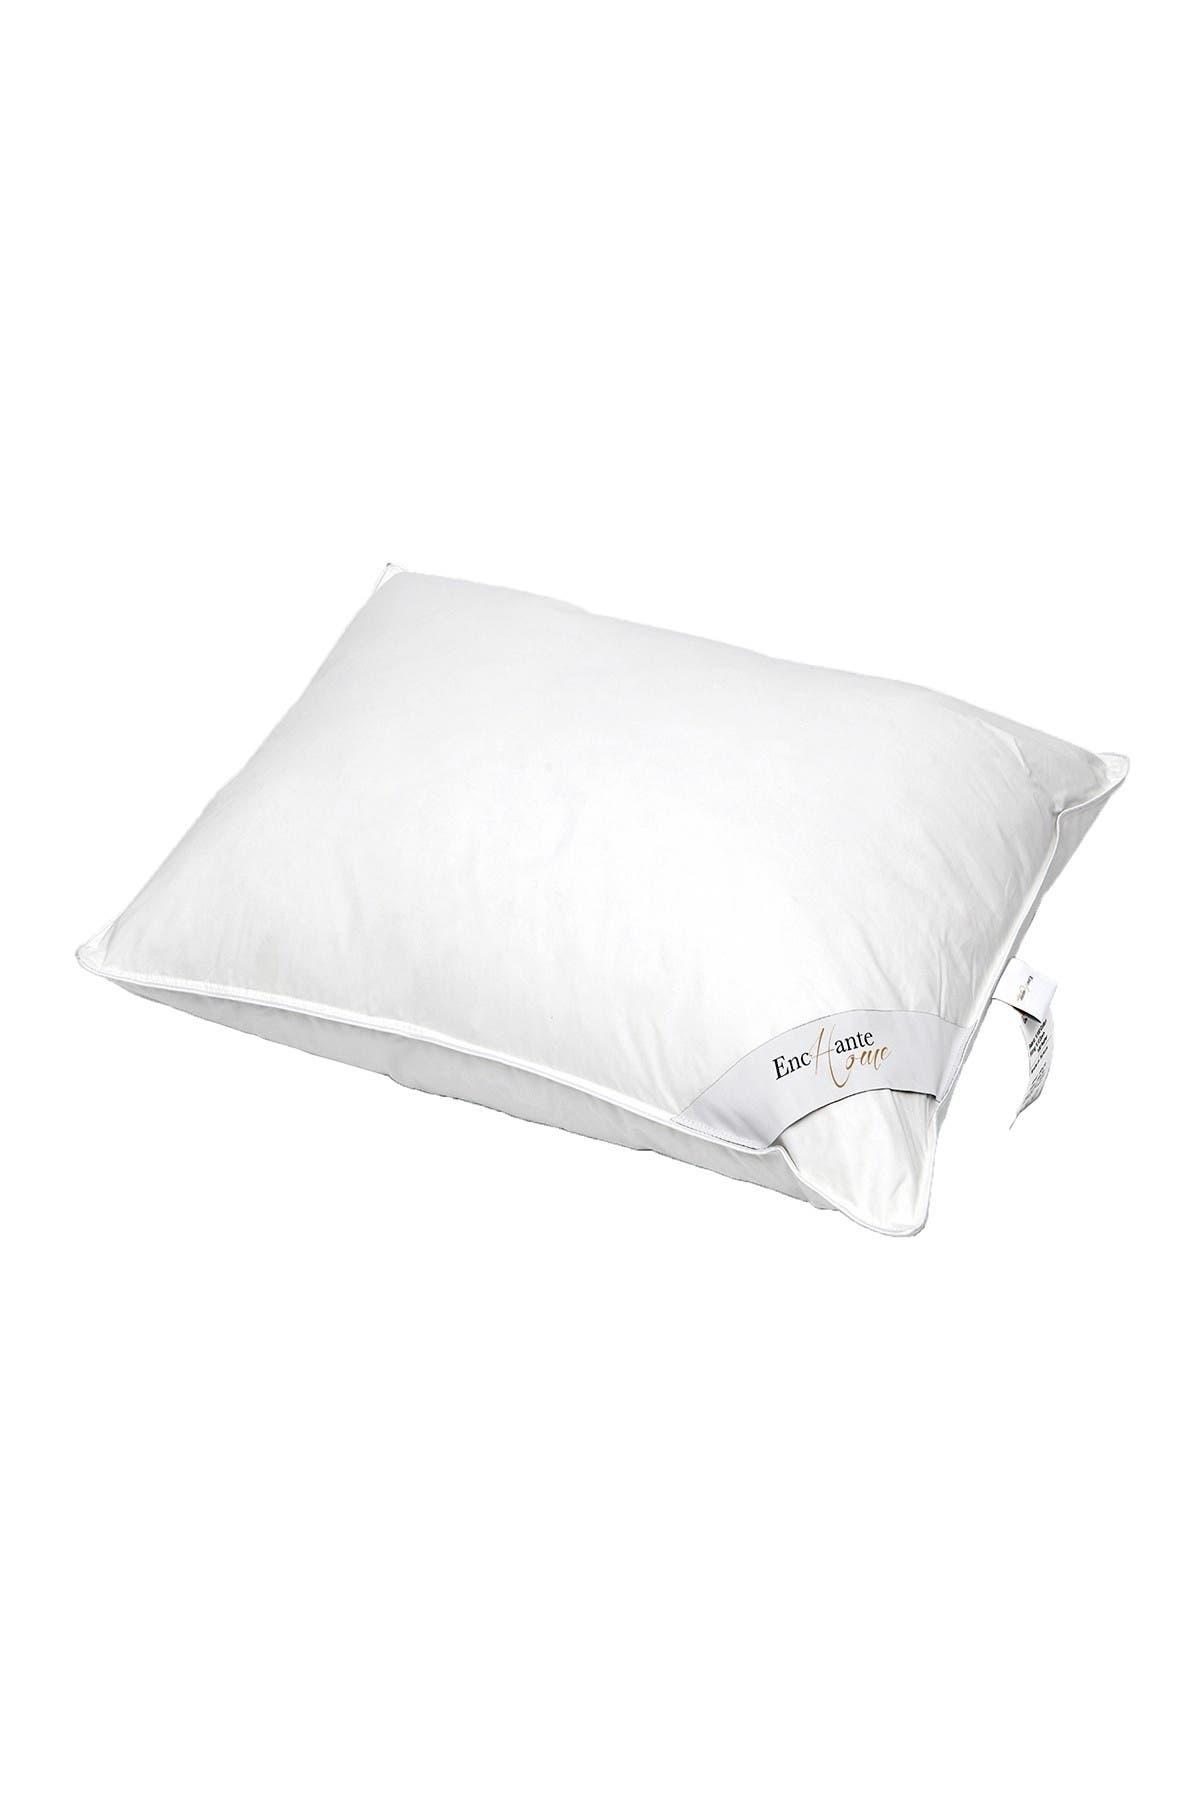 Image of ENCHANTE HOME Luxury European Down Medium Density Queen Size Feather Pillow - White